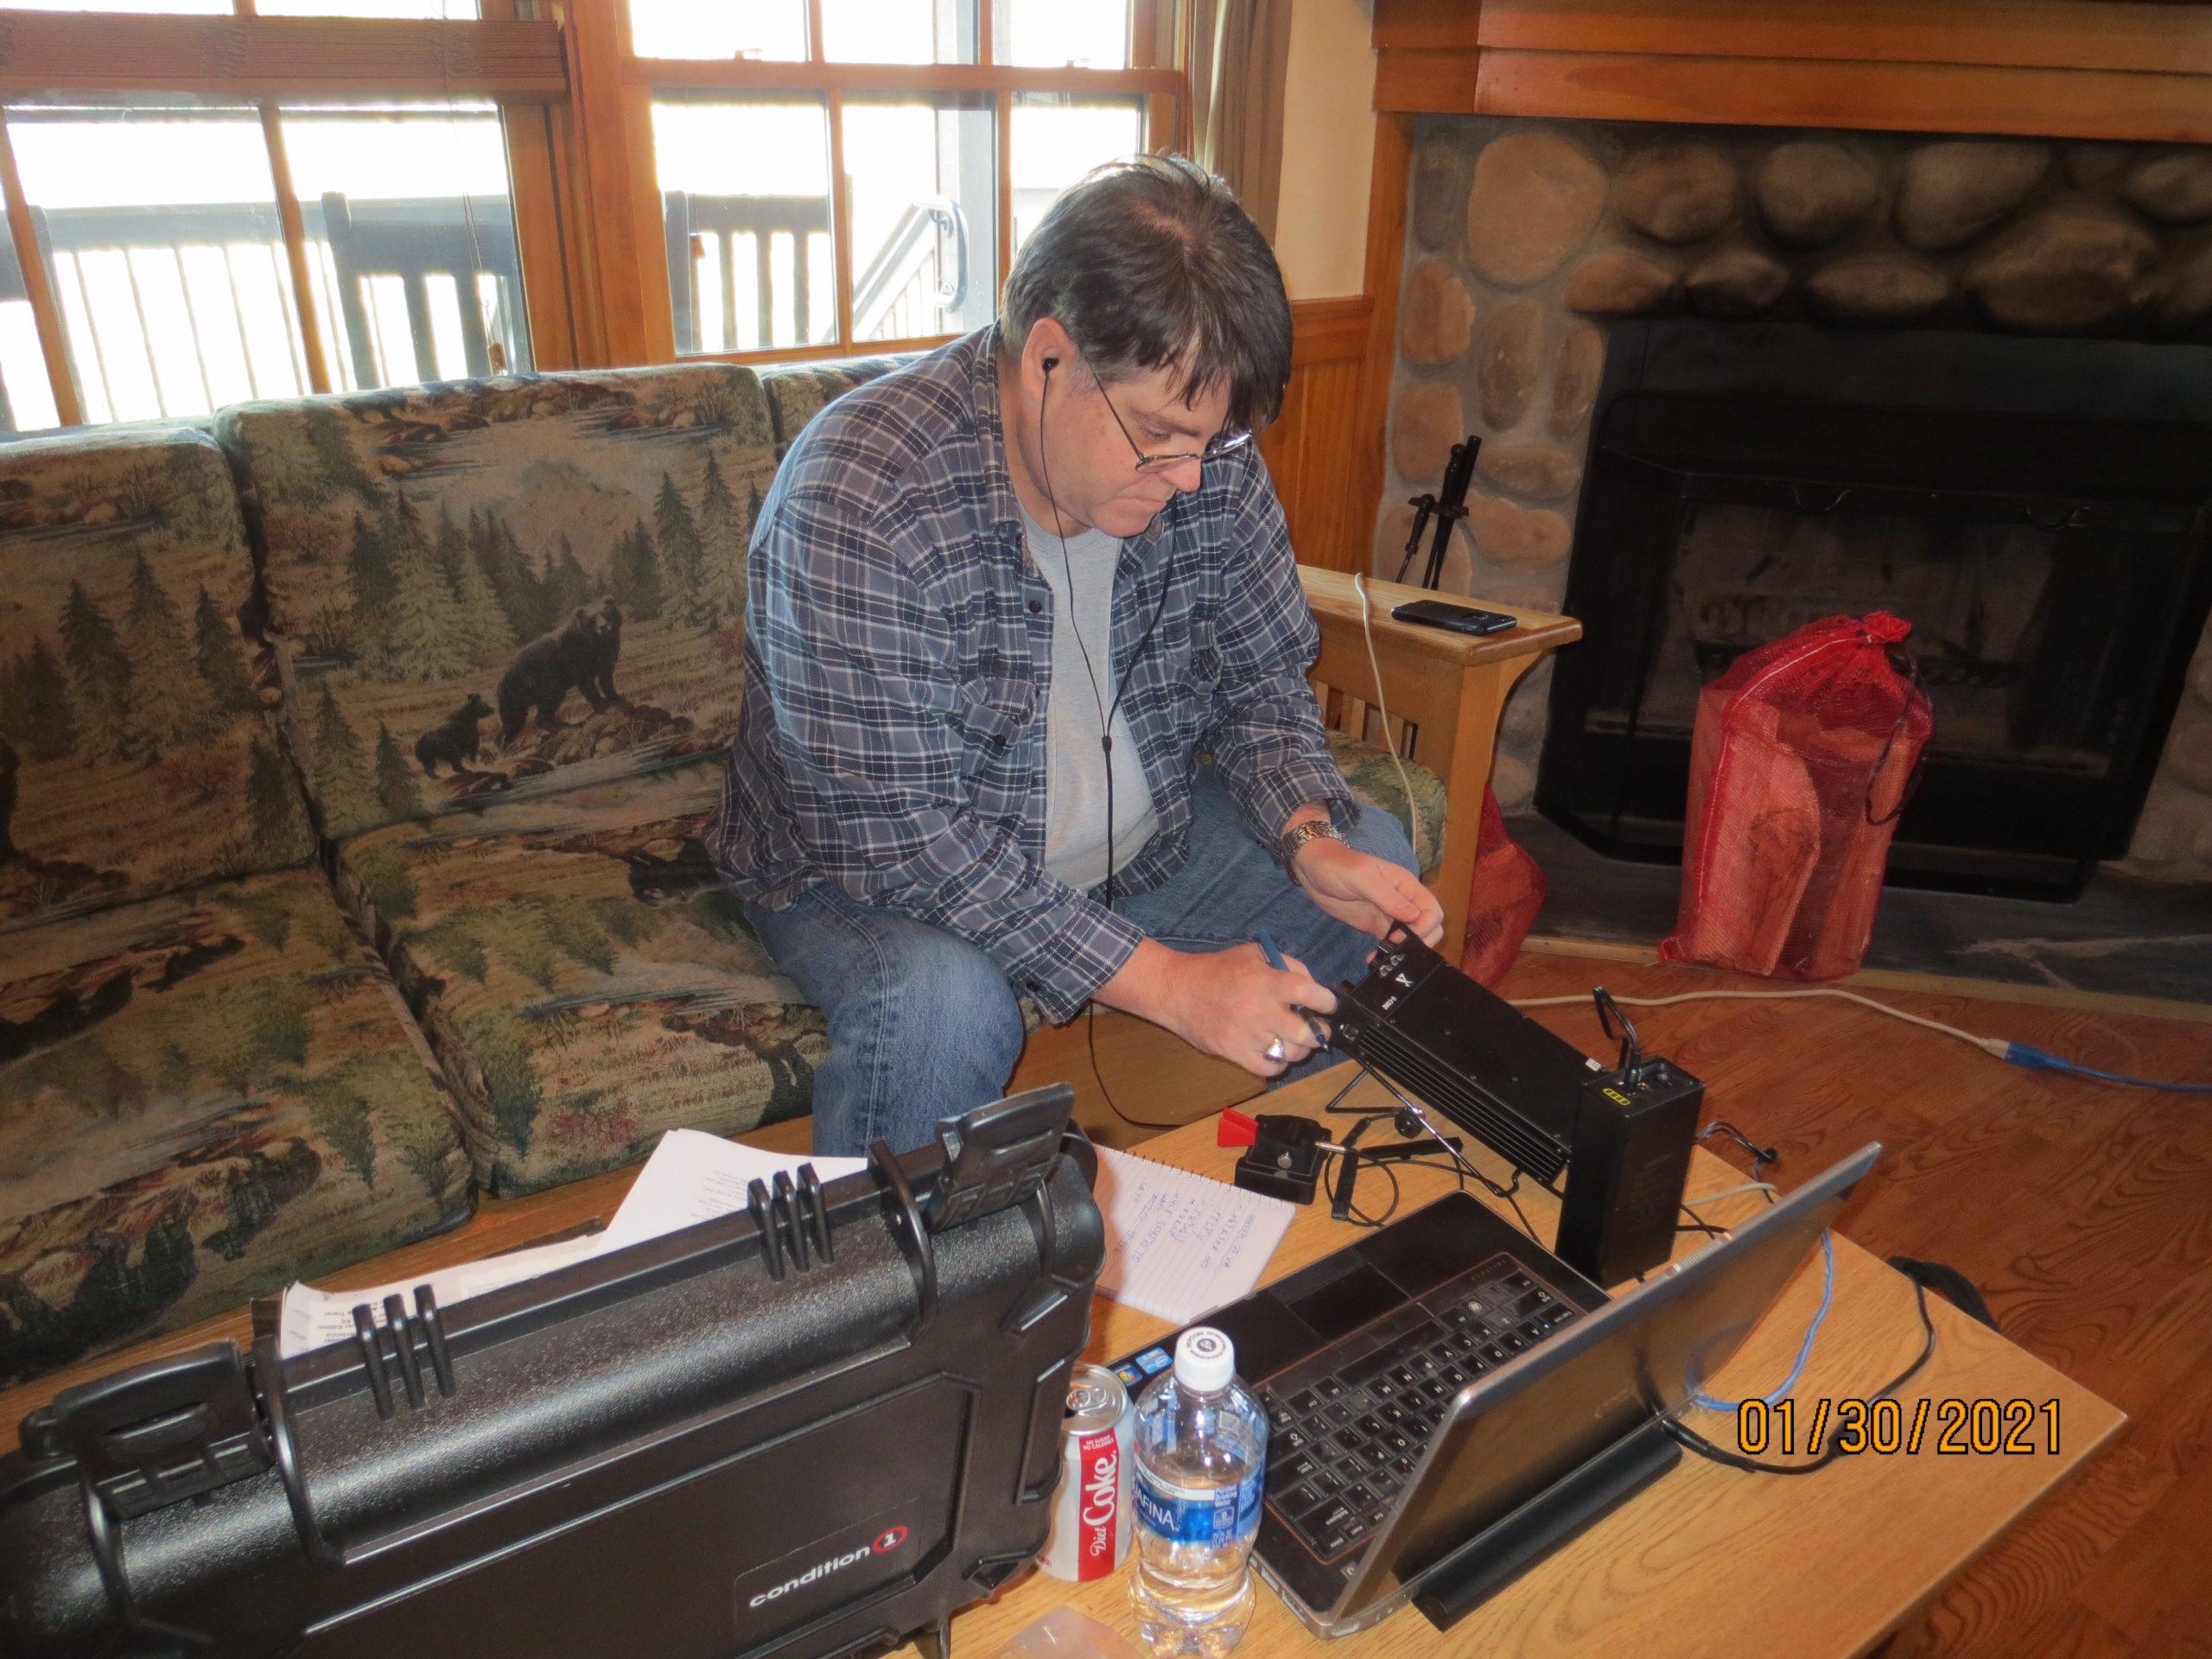 Don WA2SWX operates 20 M cw with 20 watts